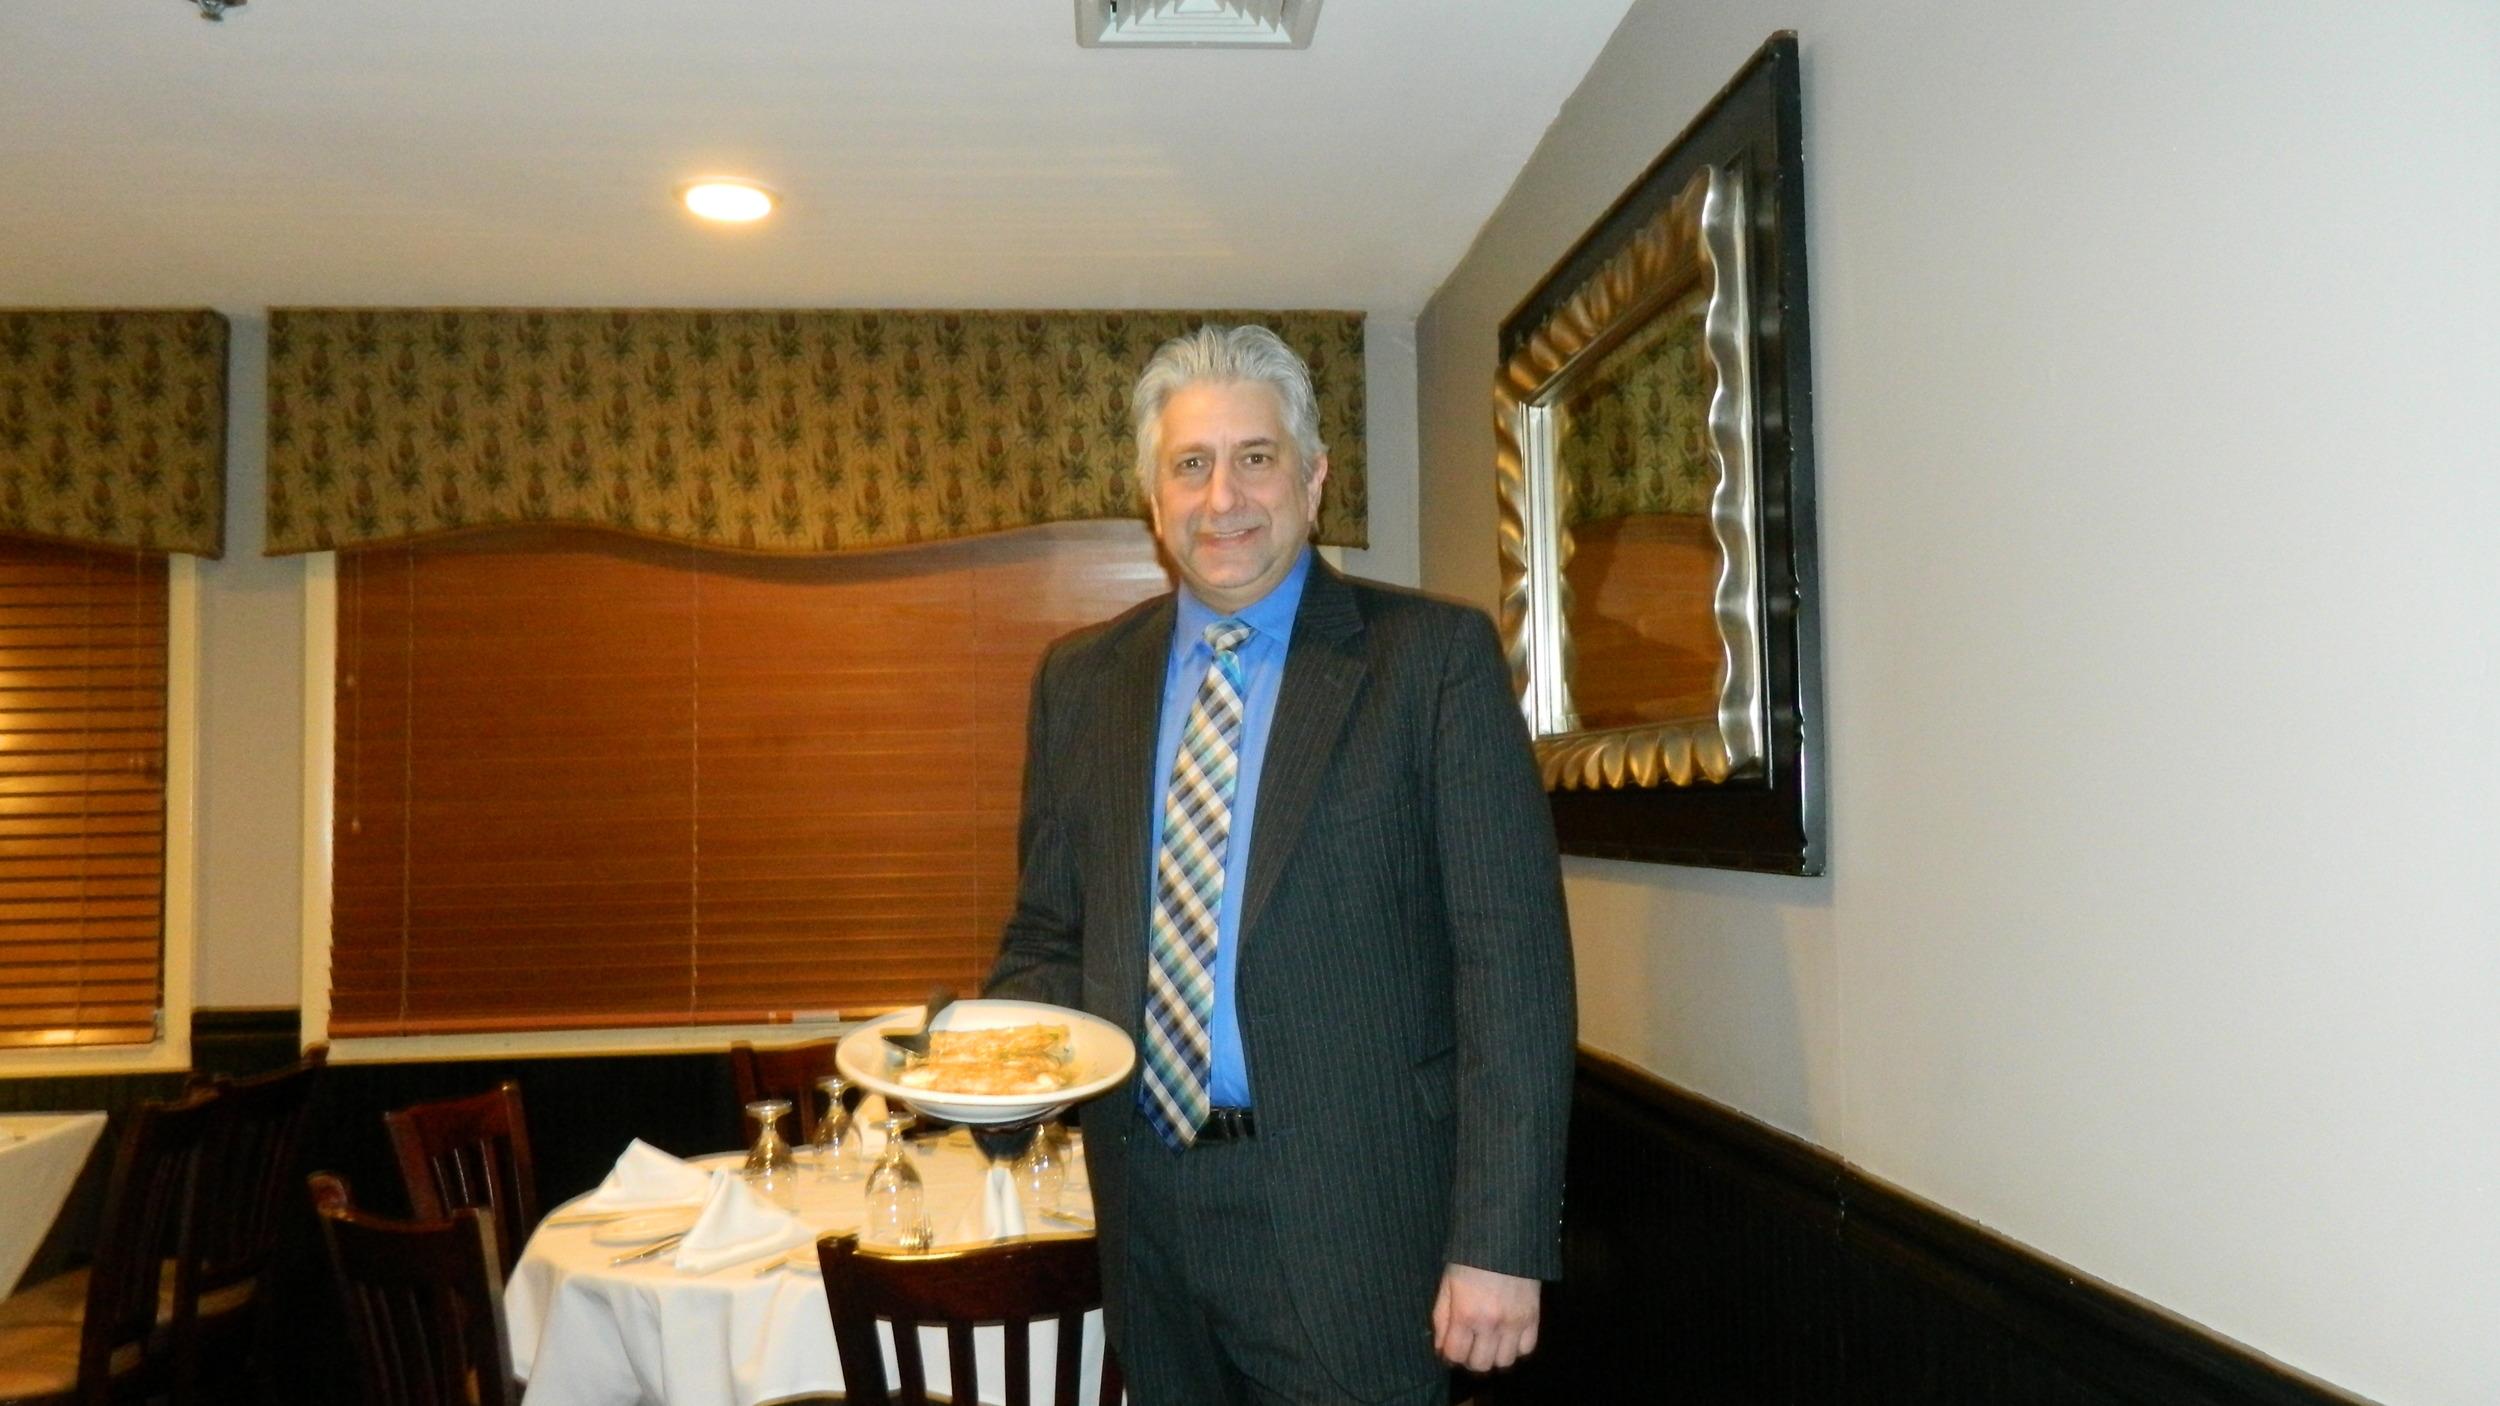 Owner John Lubrano presents Piccola Bussola's Lobster Ravioli entree.